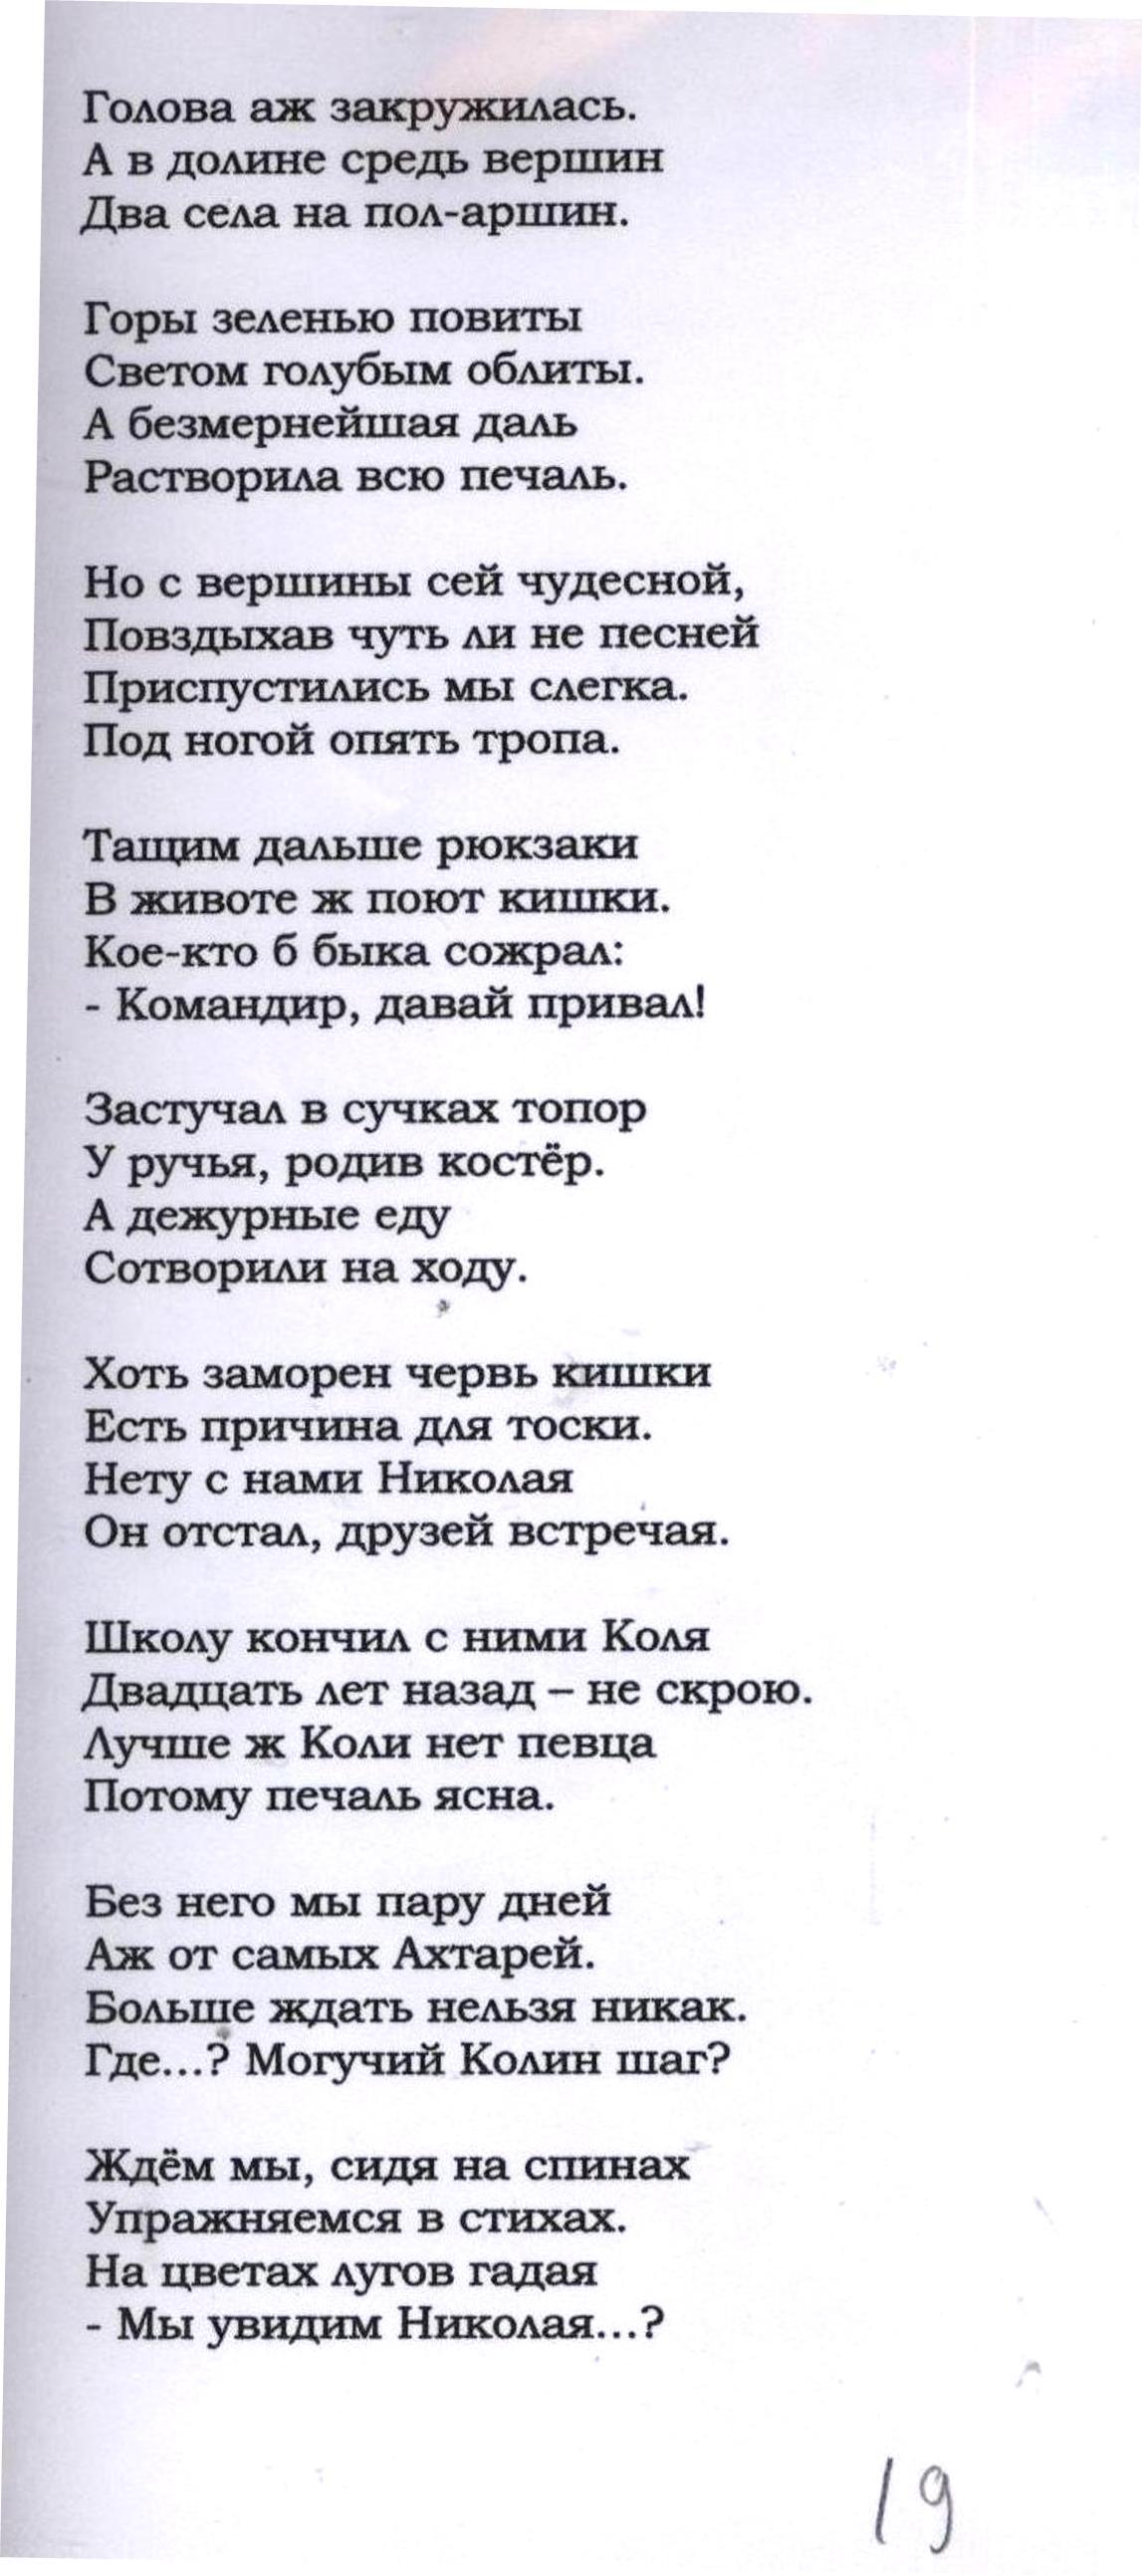 Стихи 018.jpg